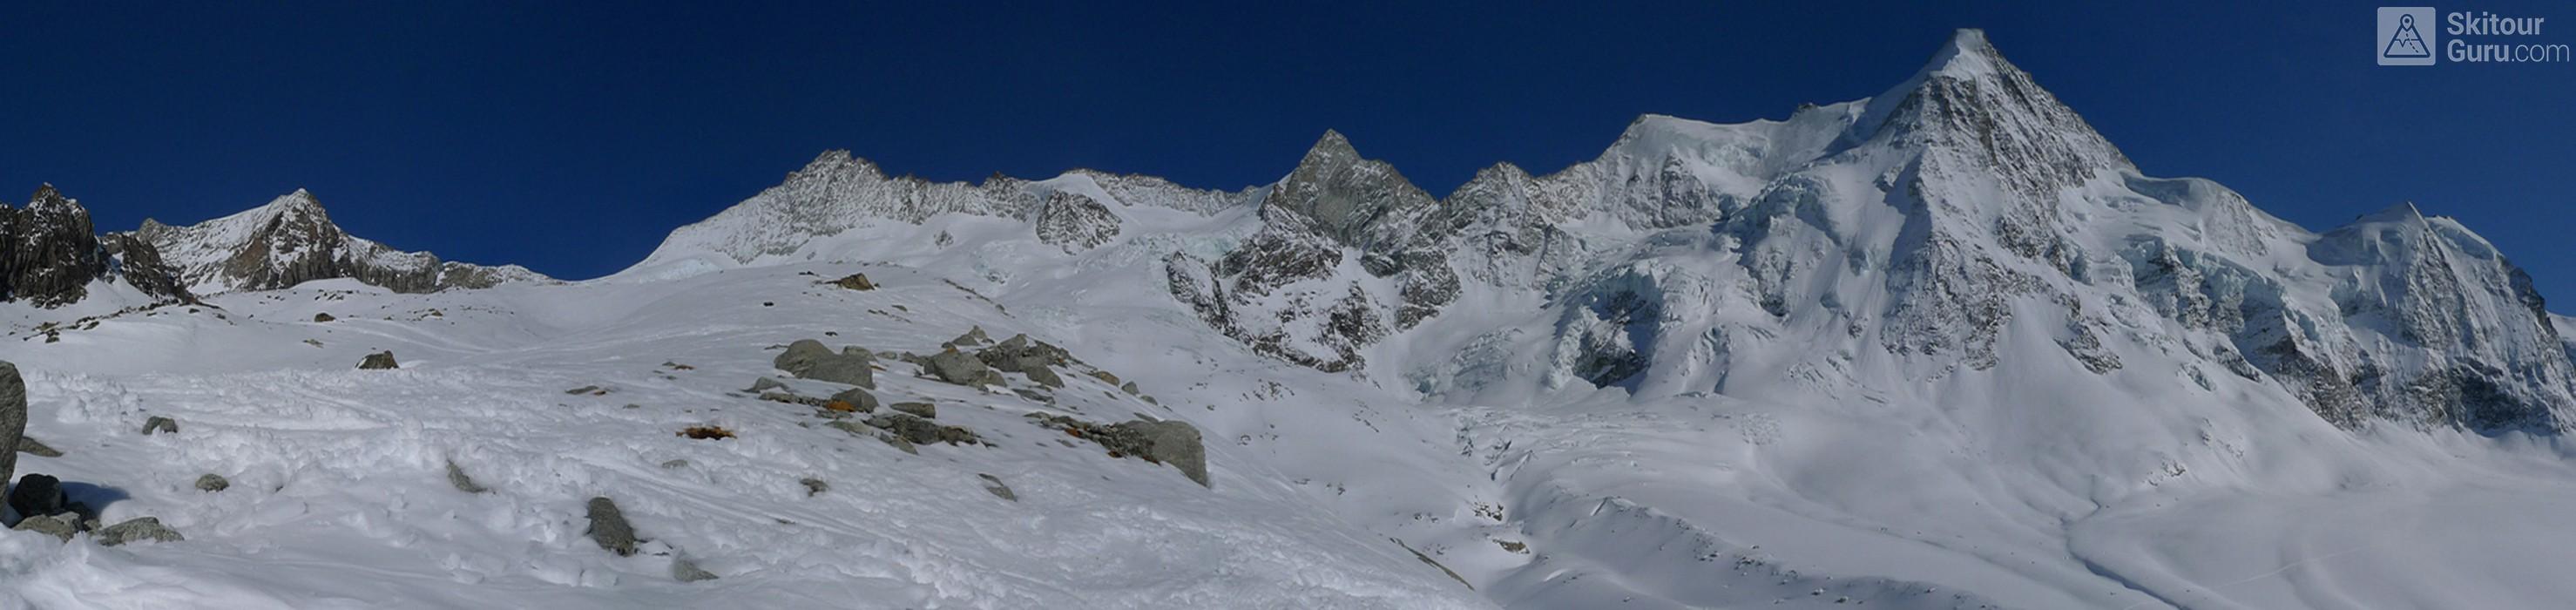 Cabane du Mountet Walliser Alpen / Alpes valaisannes Švýcarsko panorama 09